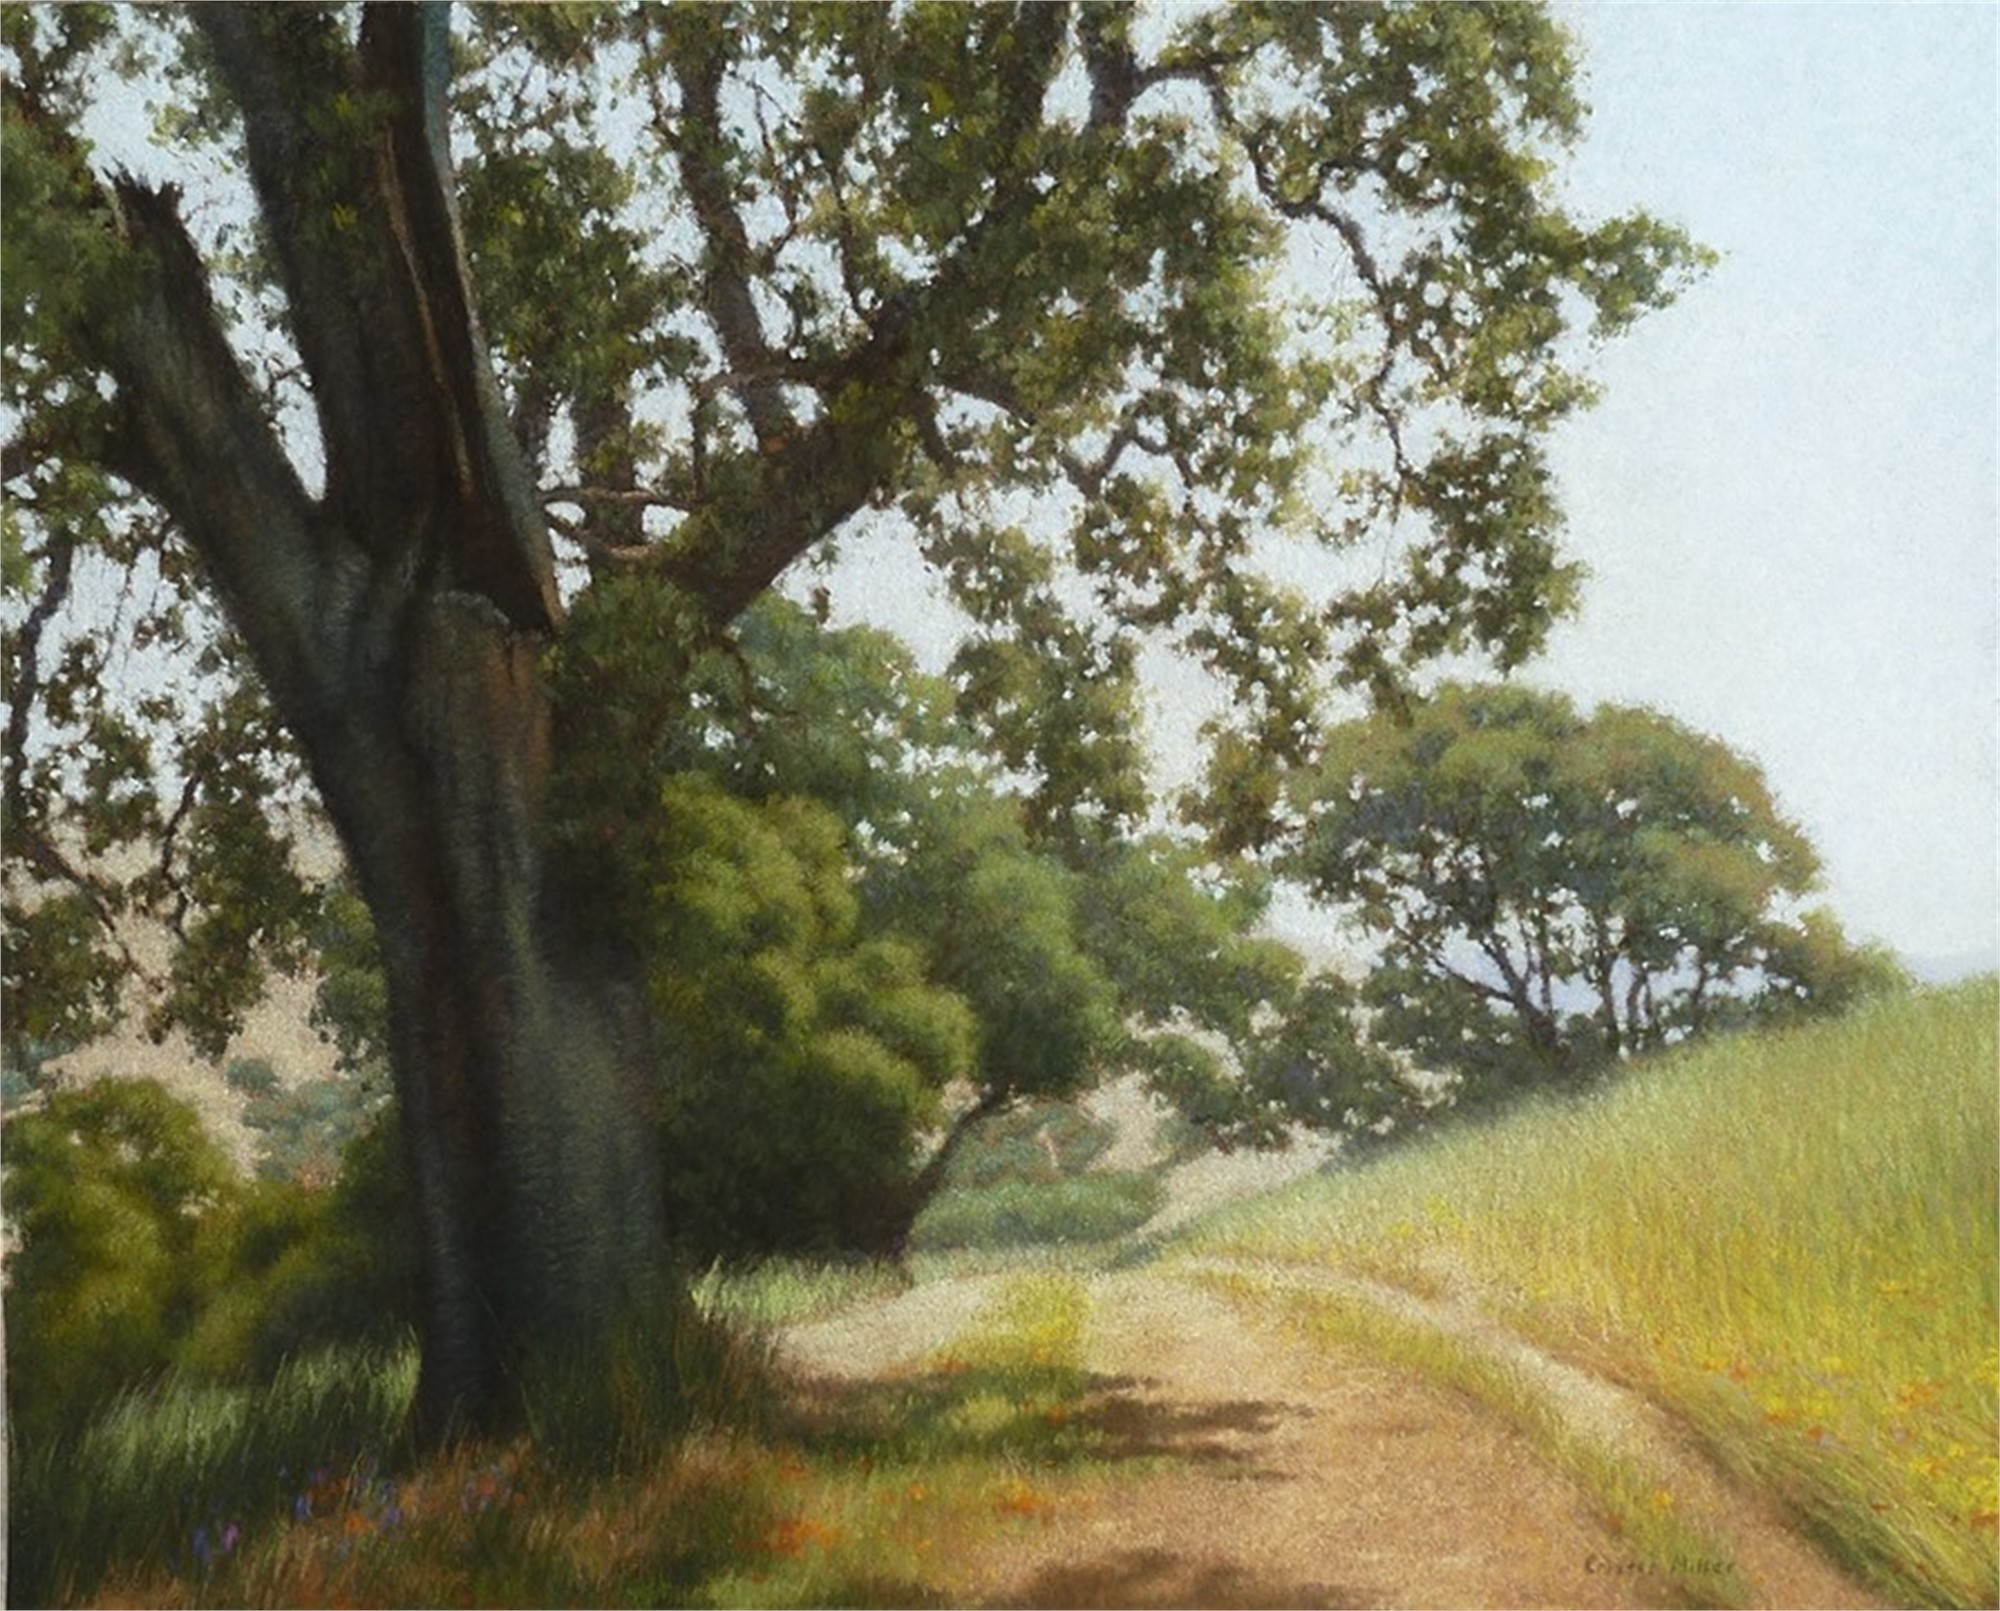 Old Oak, The by Cristen Miller